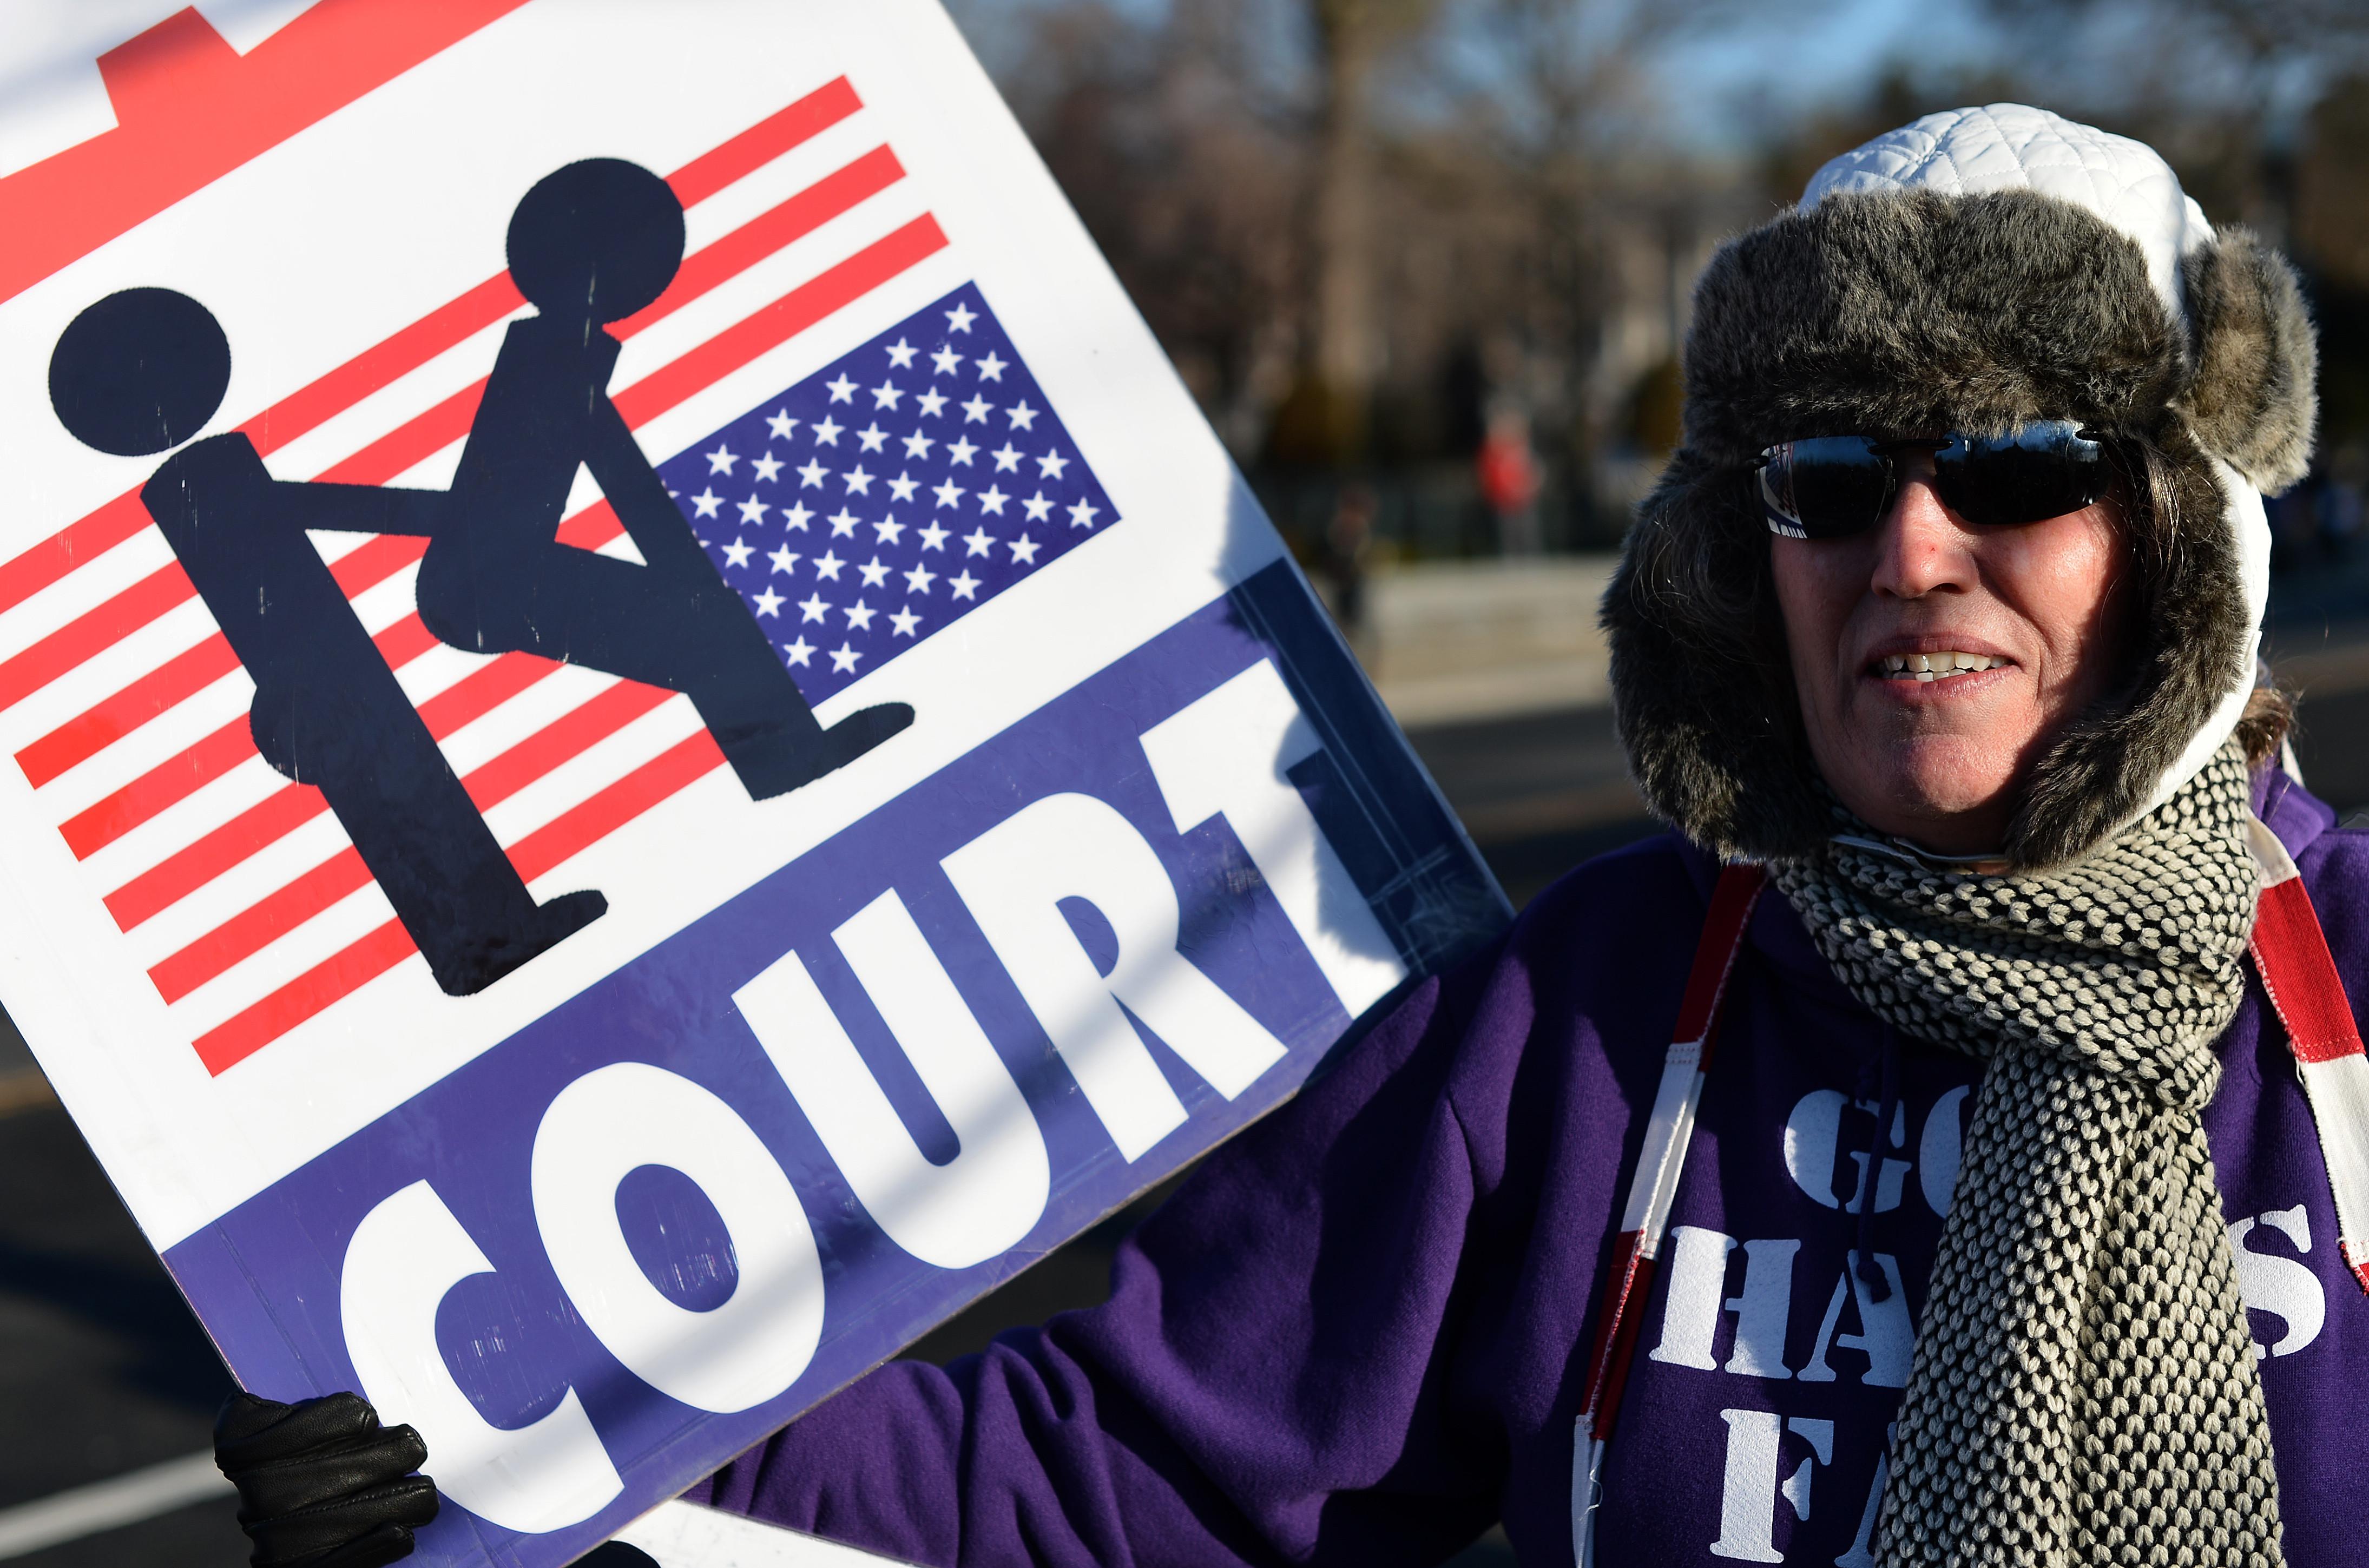 Justice Kennedy: Prop 8 Hurts Children Of Same-Sex Parents